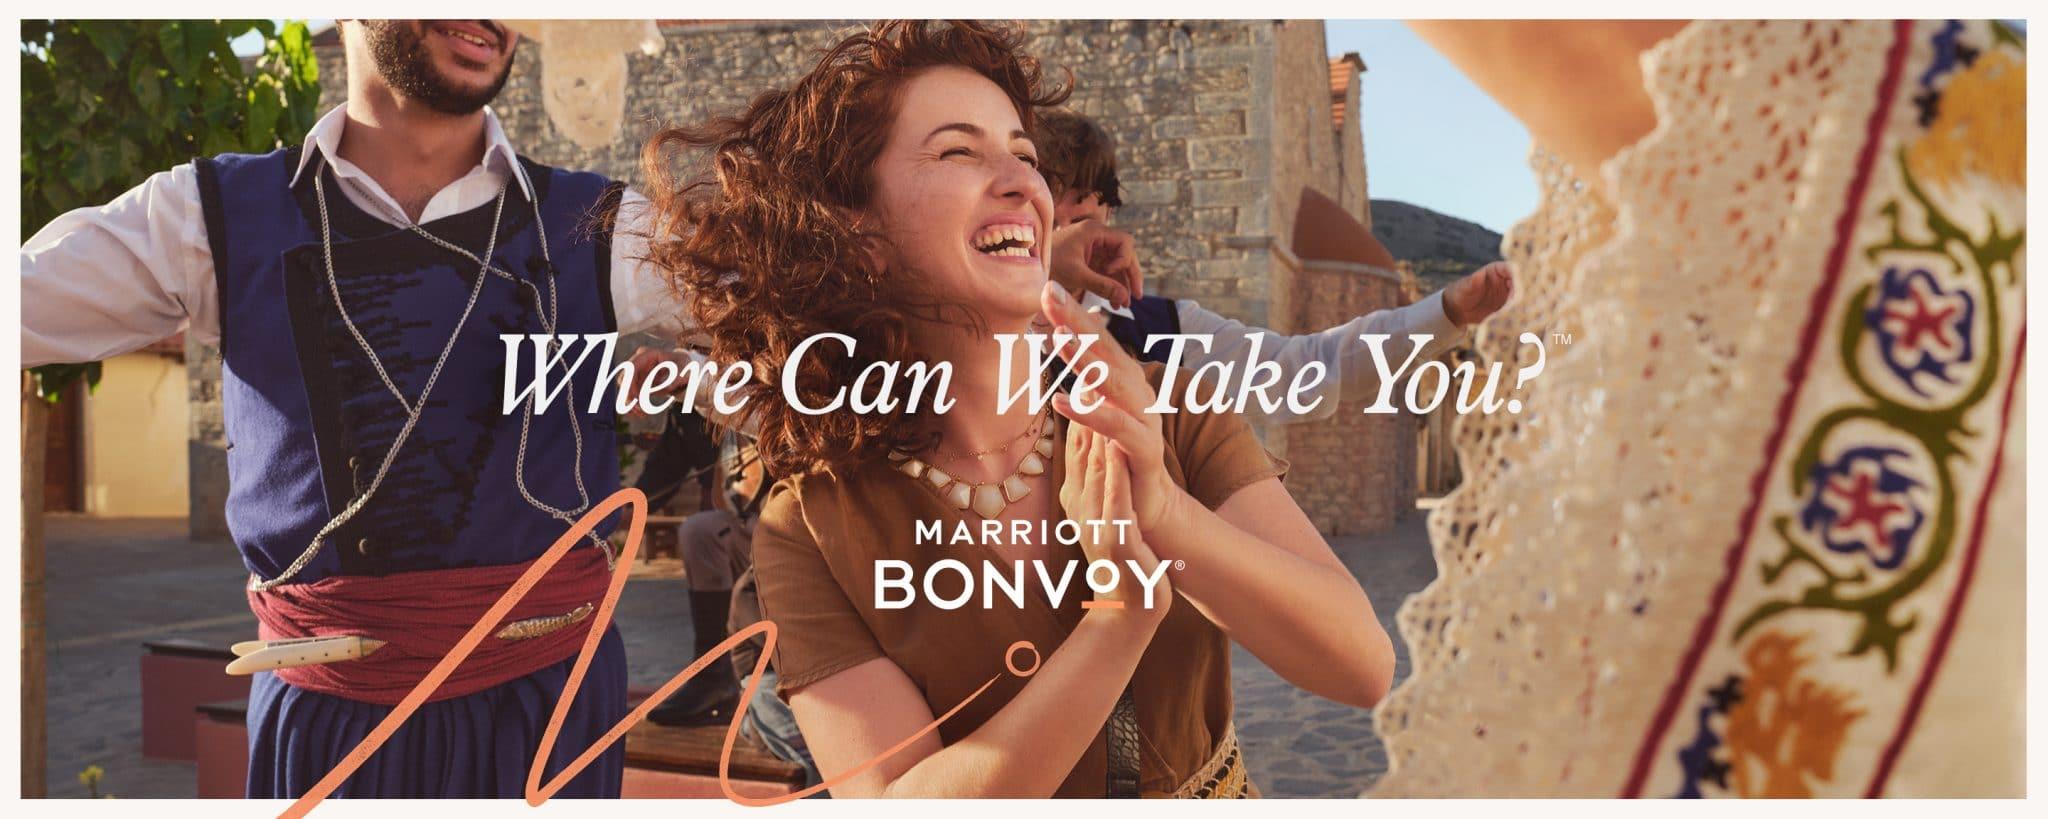 Marriott Bonvoy Proclaims the Transformative Power of Travel